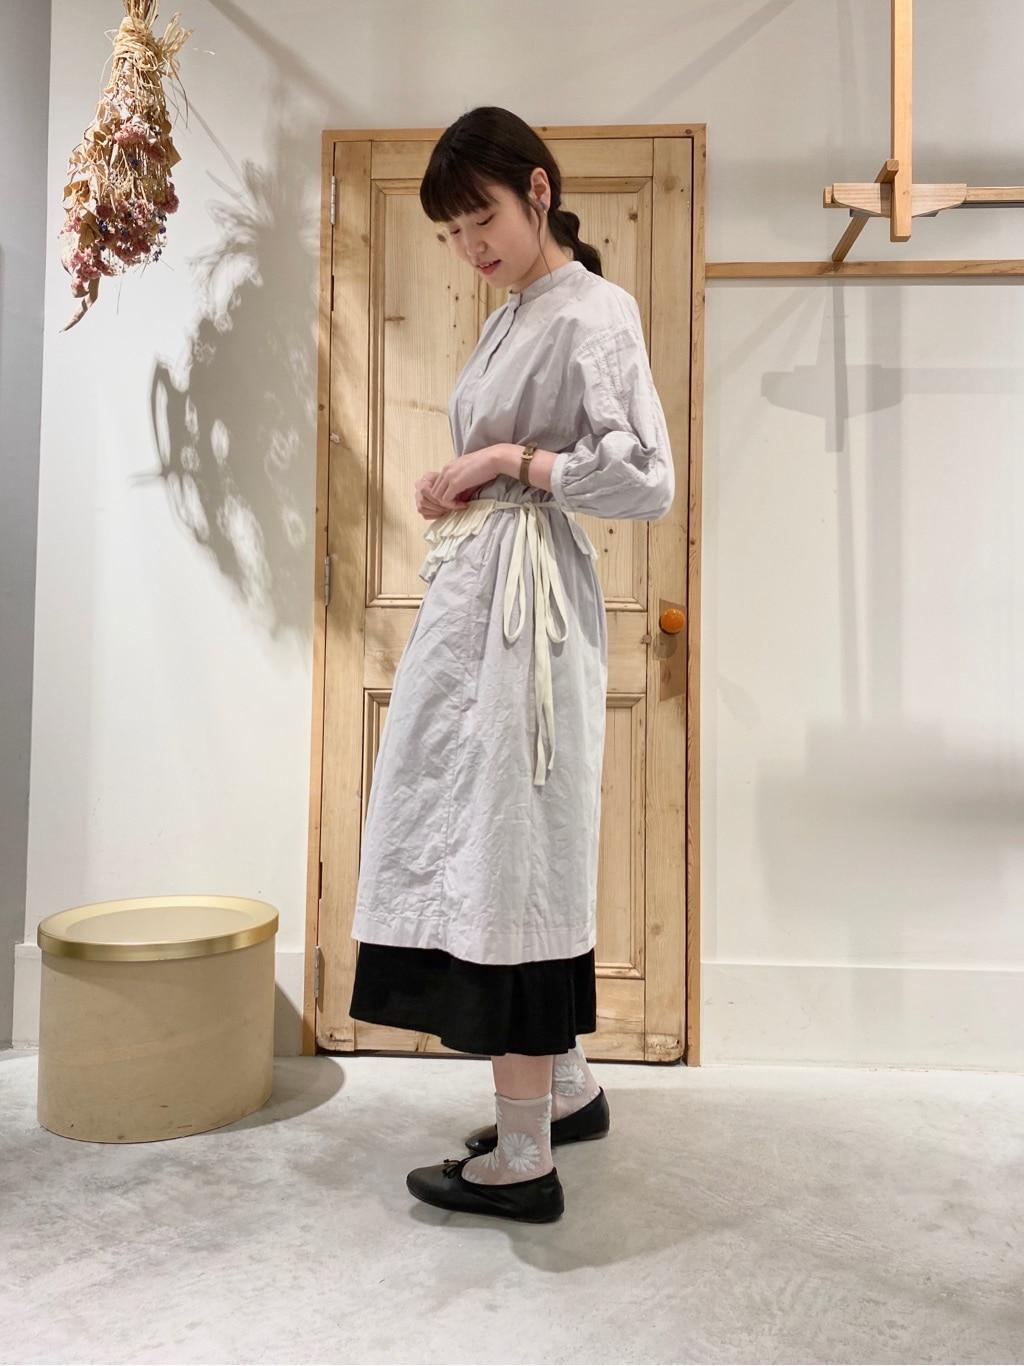 Malle chambre de charme 調布パルコ 身長:167cm 2020.06.11